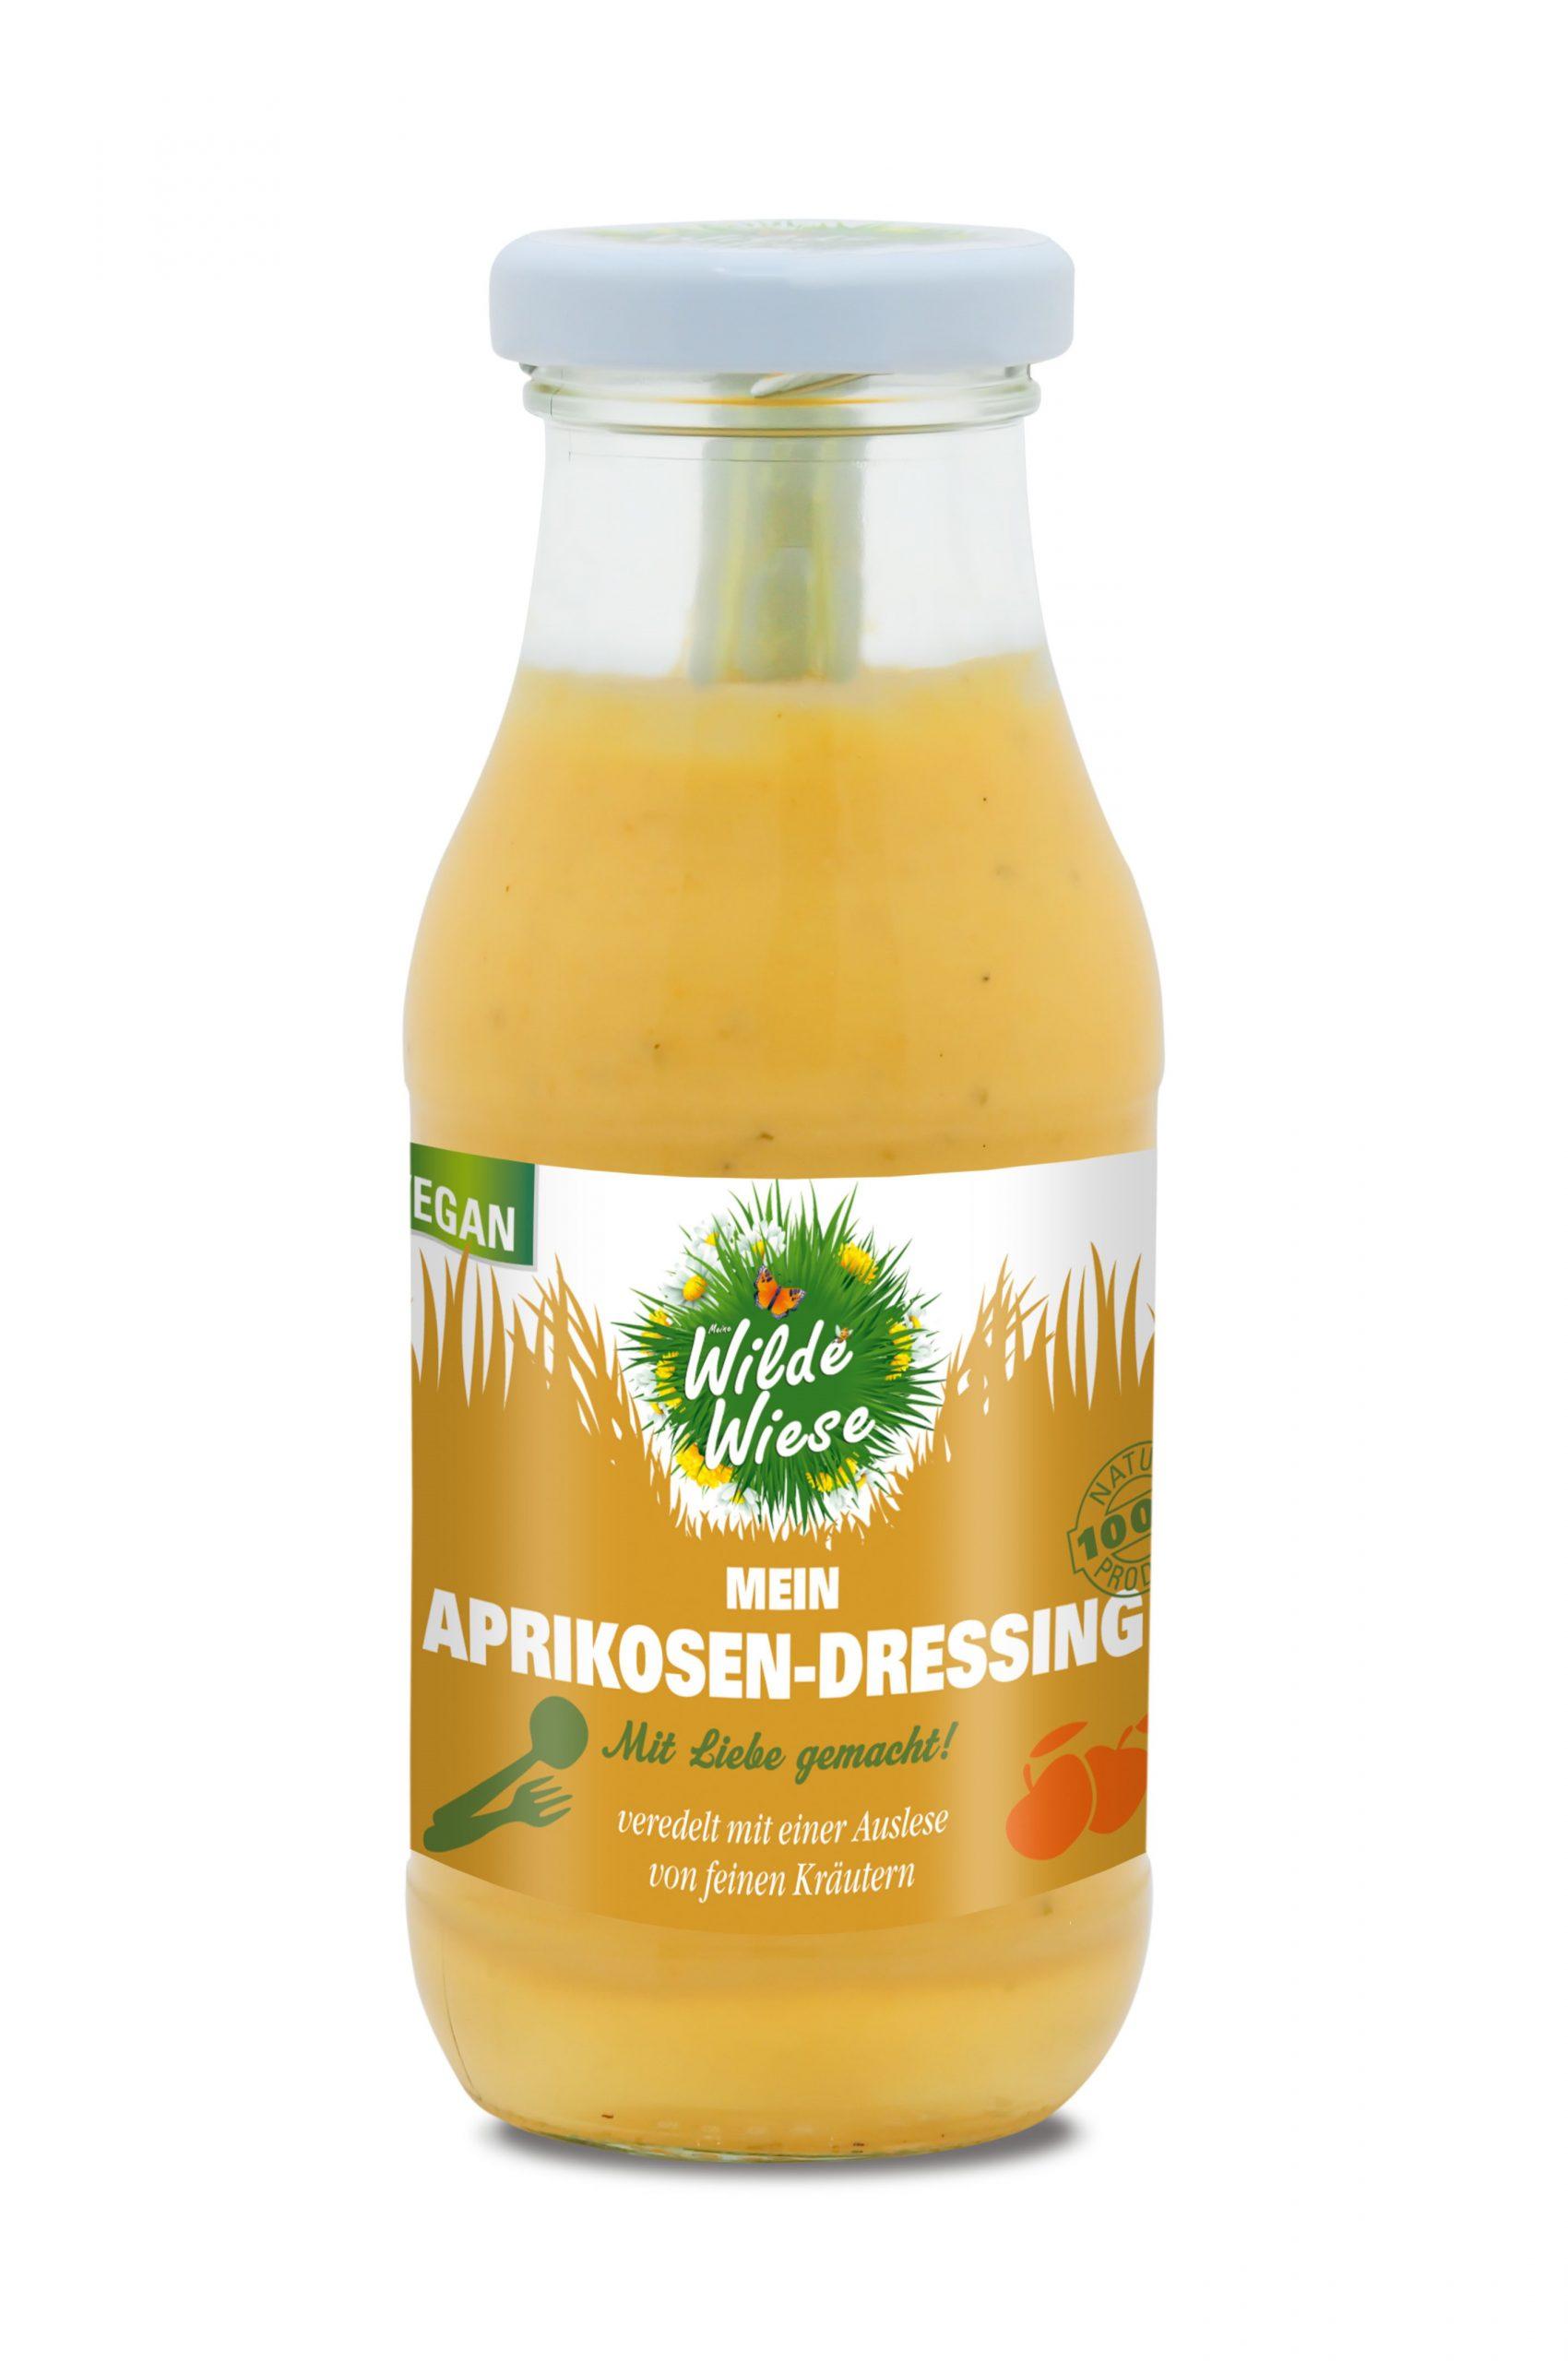 Wilde Wiese - Mein Aprikosen Dressing - Kräutern - Vegan